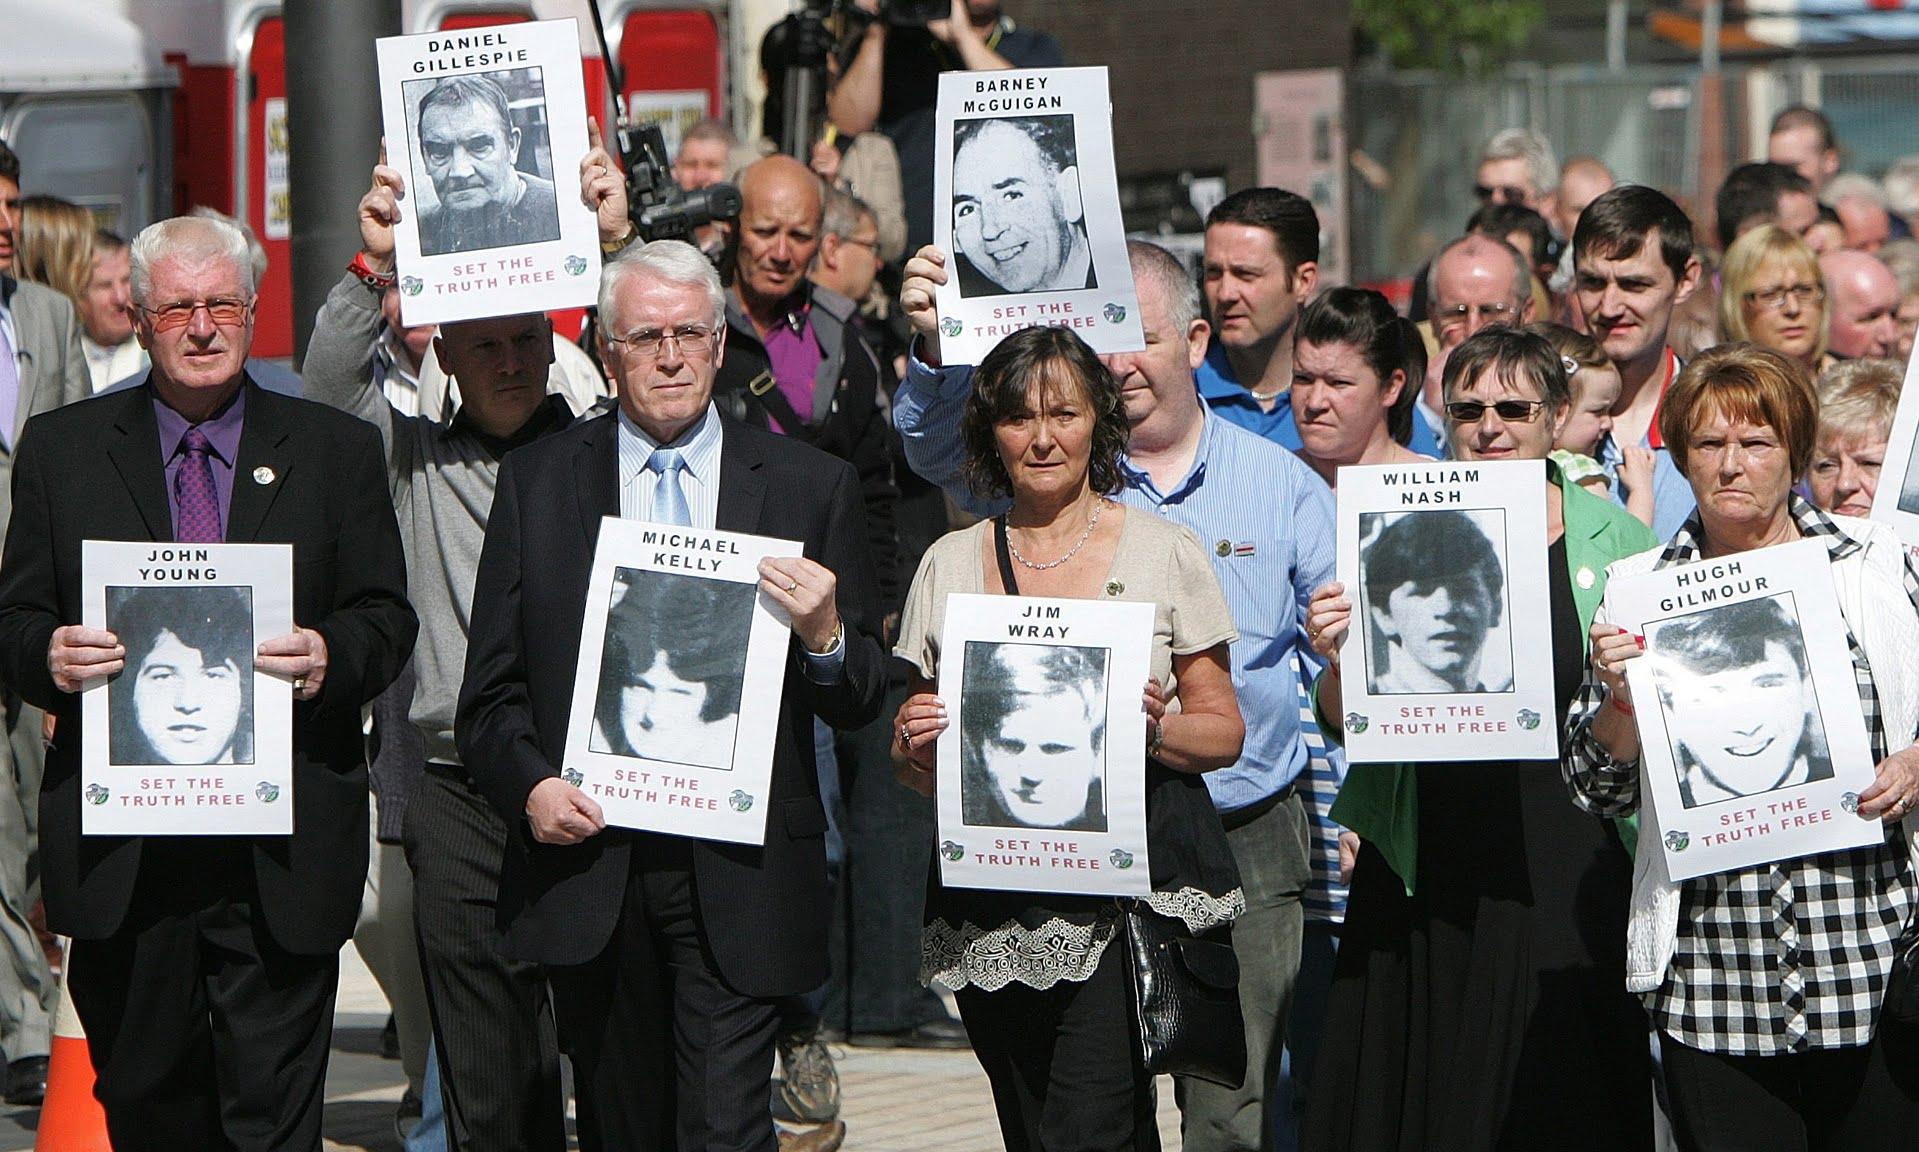 Bloody Sunday investigators arrest 66-year-old former soldier